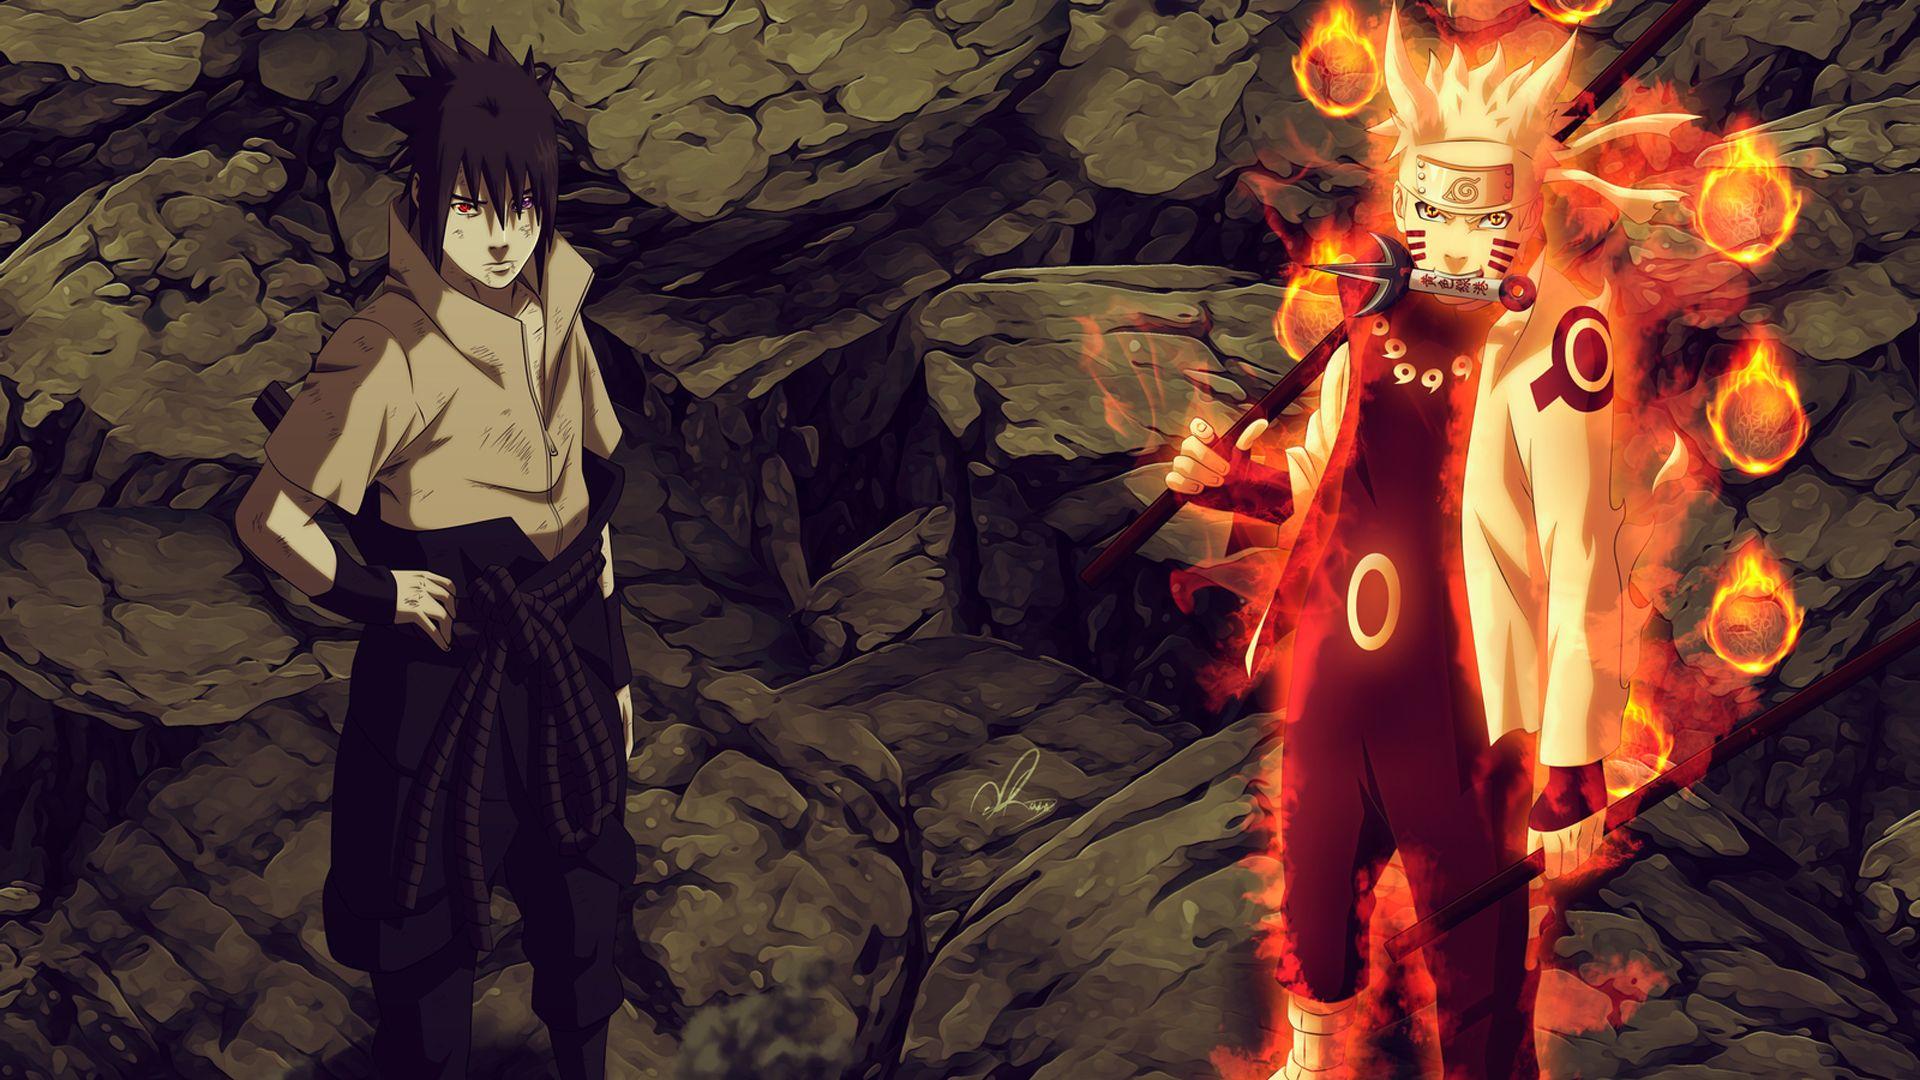 Naruto In Sage Of Six Paths And Sasuke With Rinnegan Naruto And Sasuke Wallpaper Wallpaper Naruto Shippuden Naruto Wallpaper